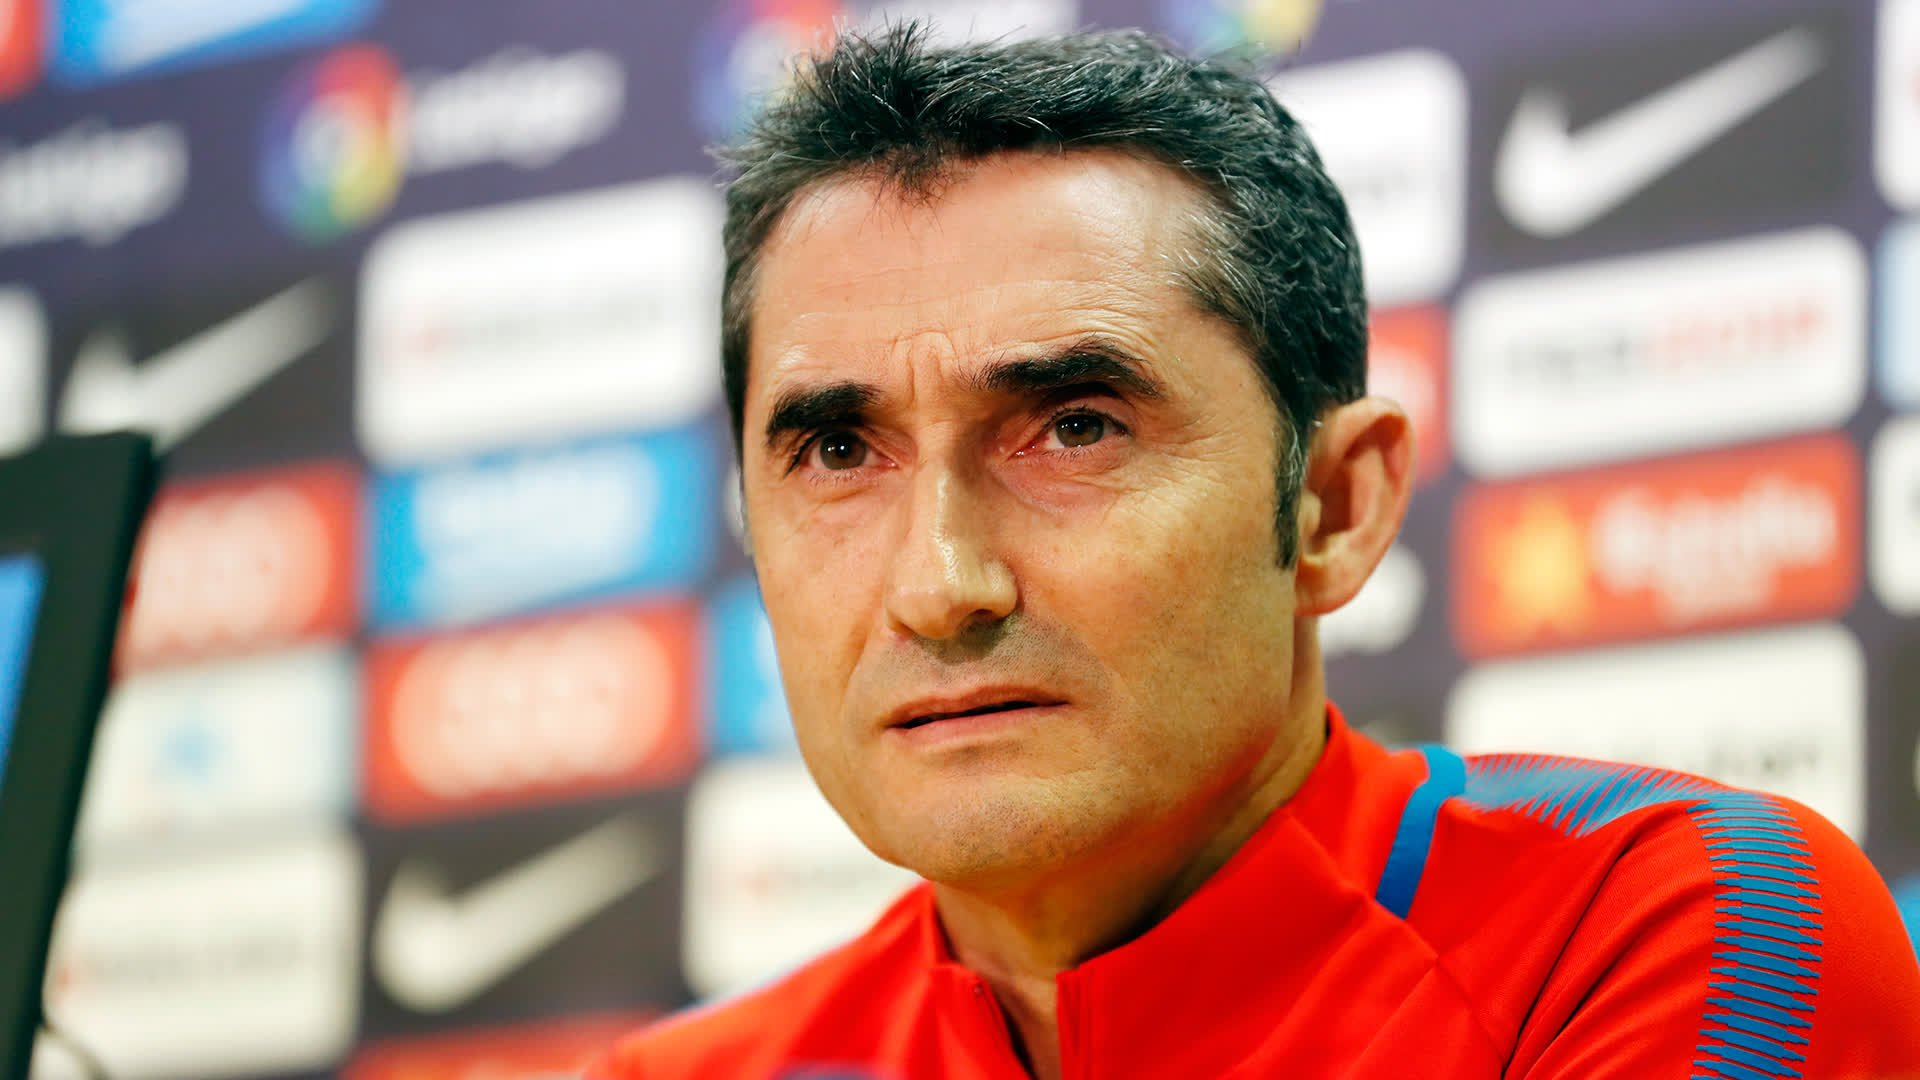 #GetafeBarça Relive Valverde's pre-#GetafeBarça press conference https://t.co/8AUe3gase5